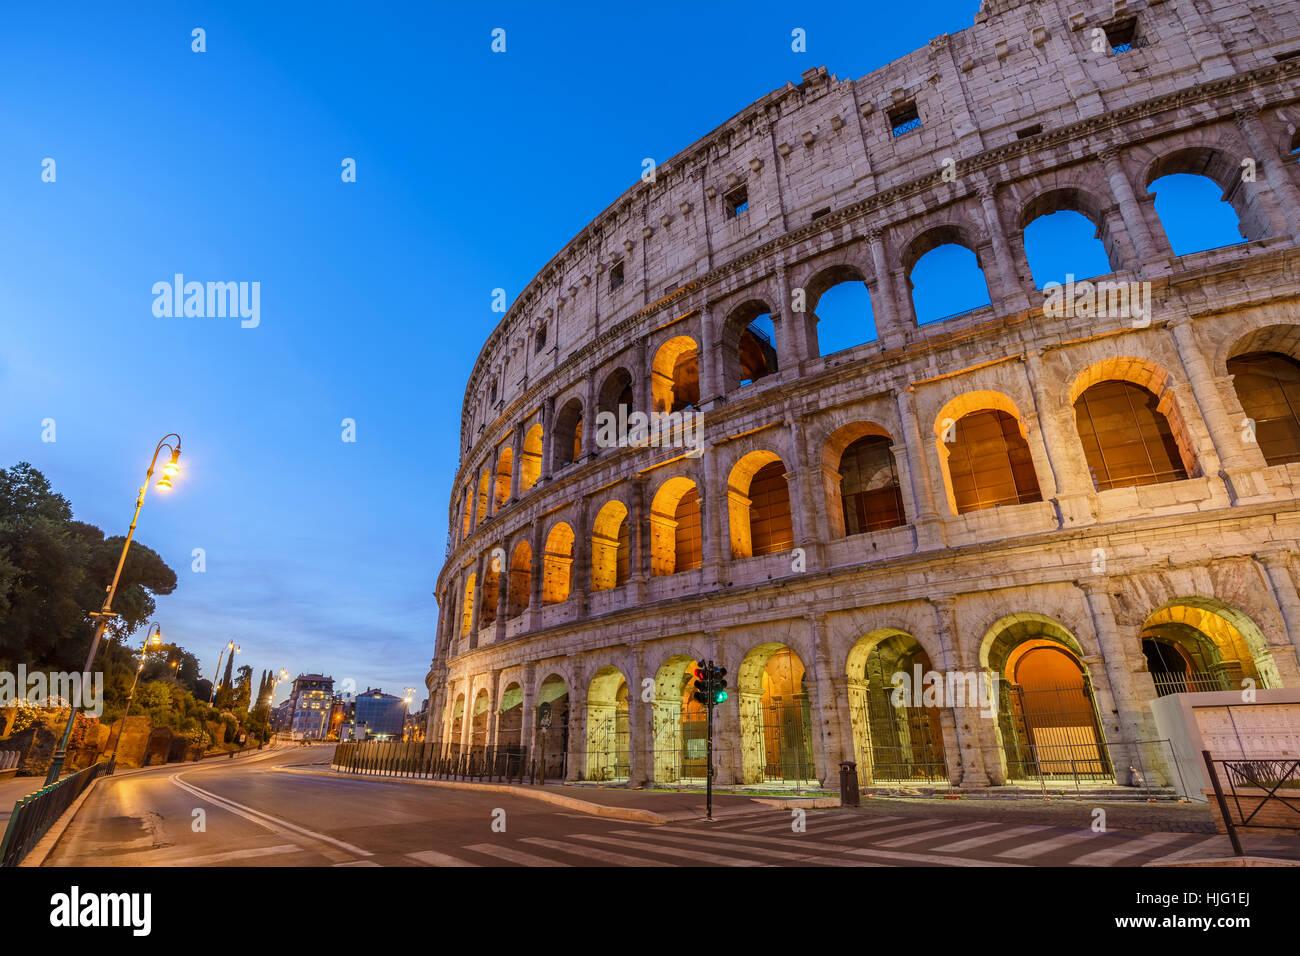 Sunrise at Rome Colosseum (Roma Coliseum), Rome, Italy - Stock Image